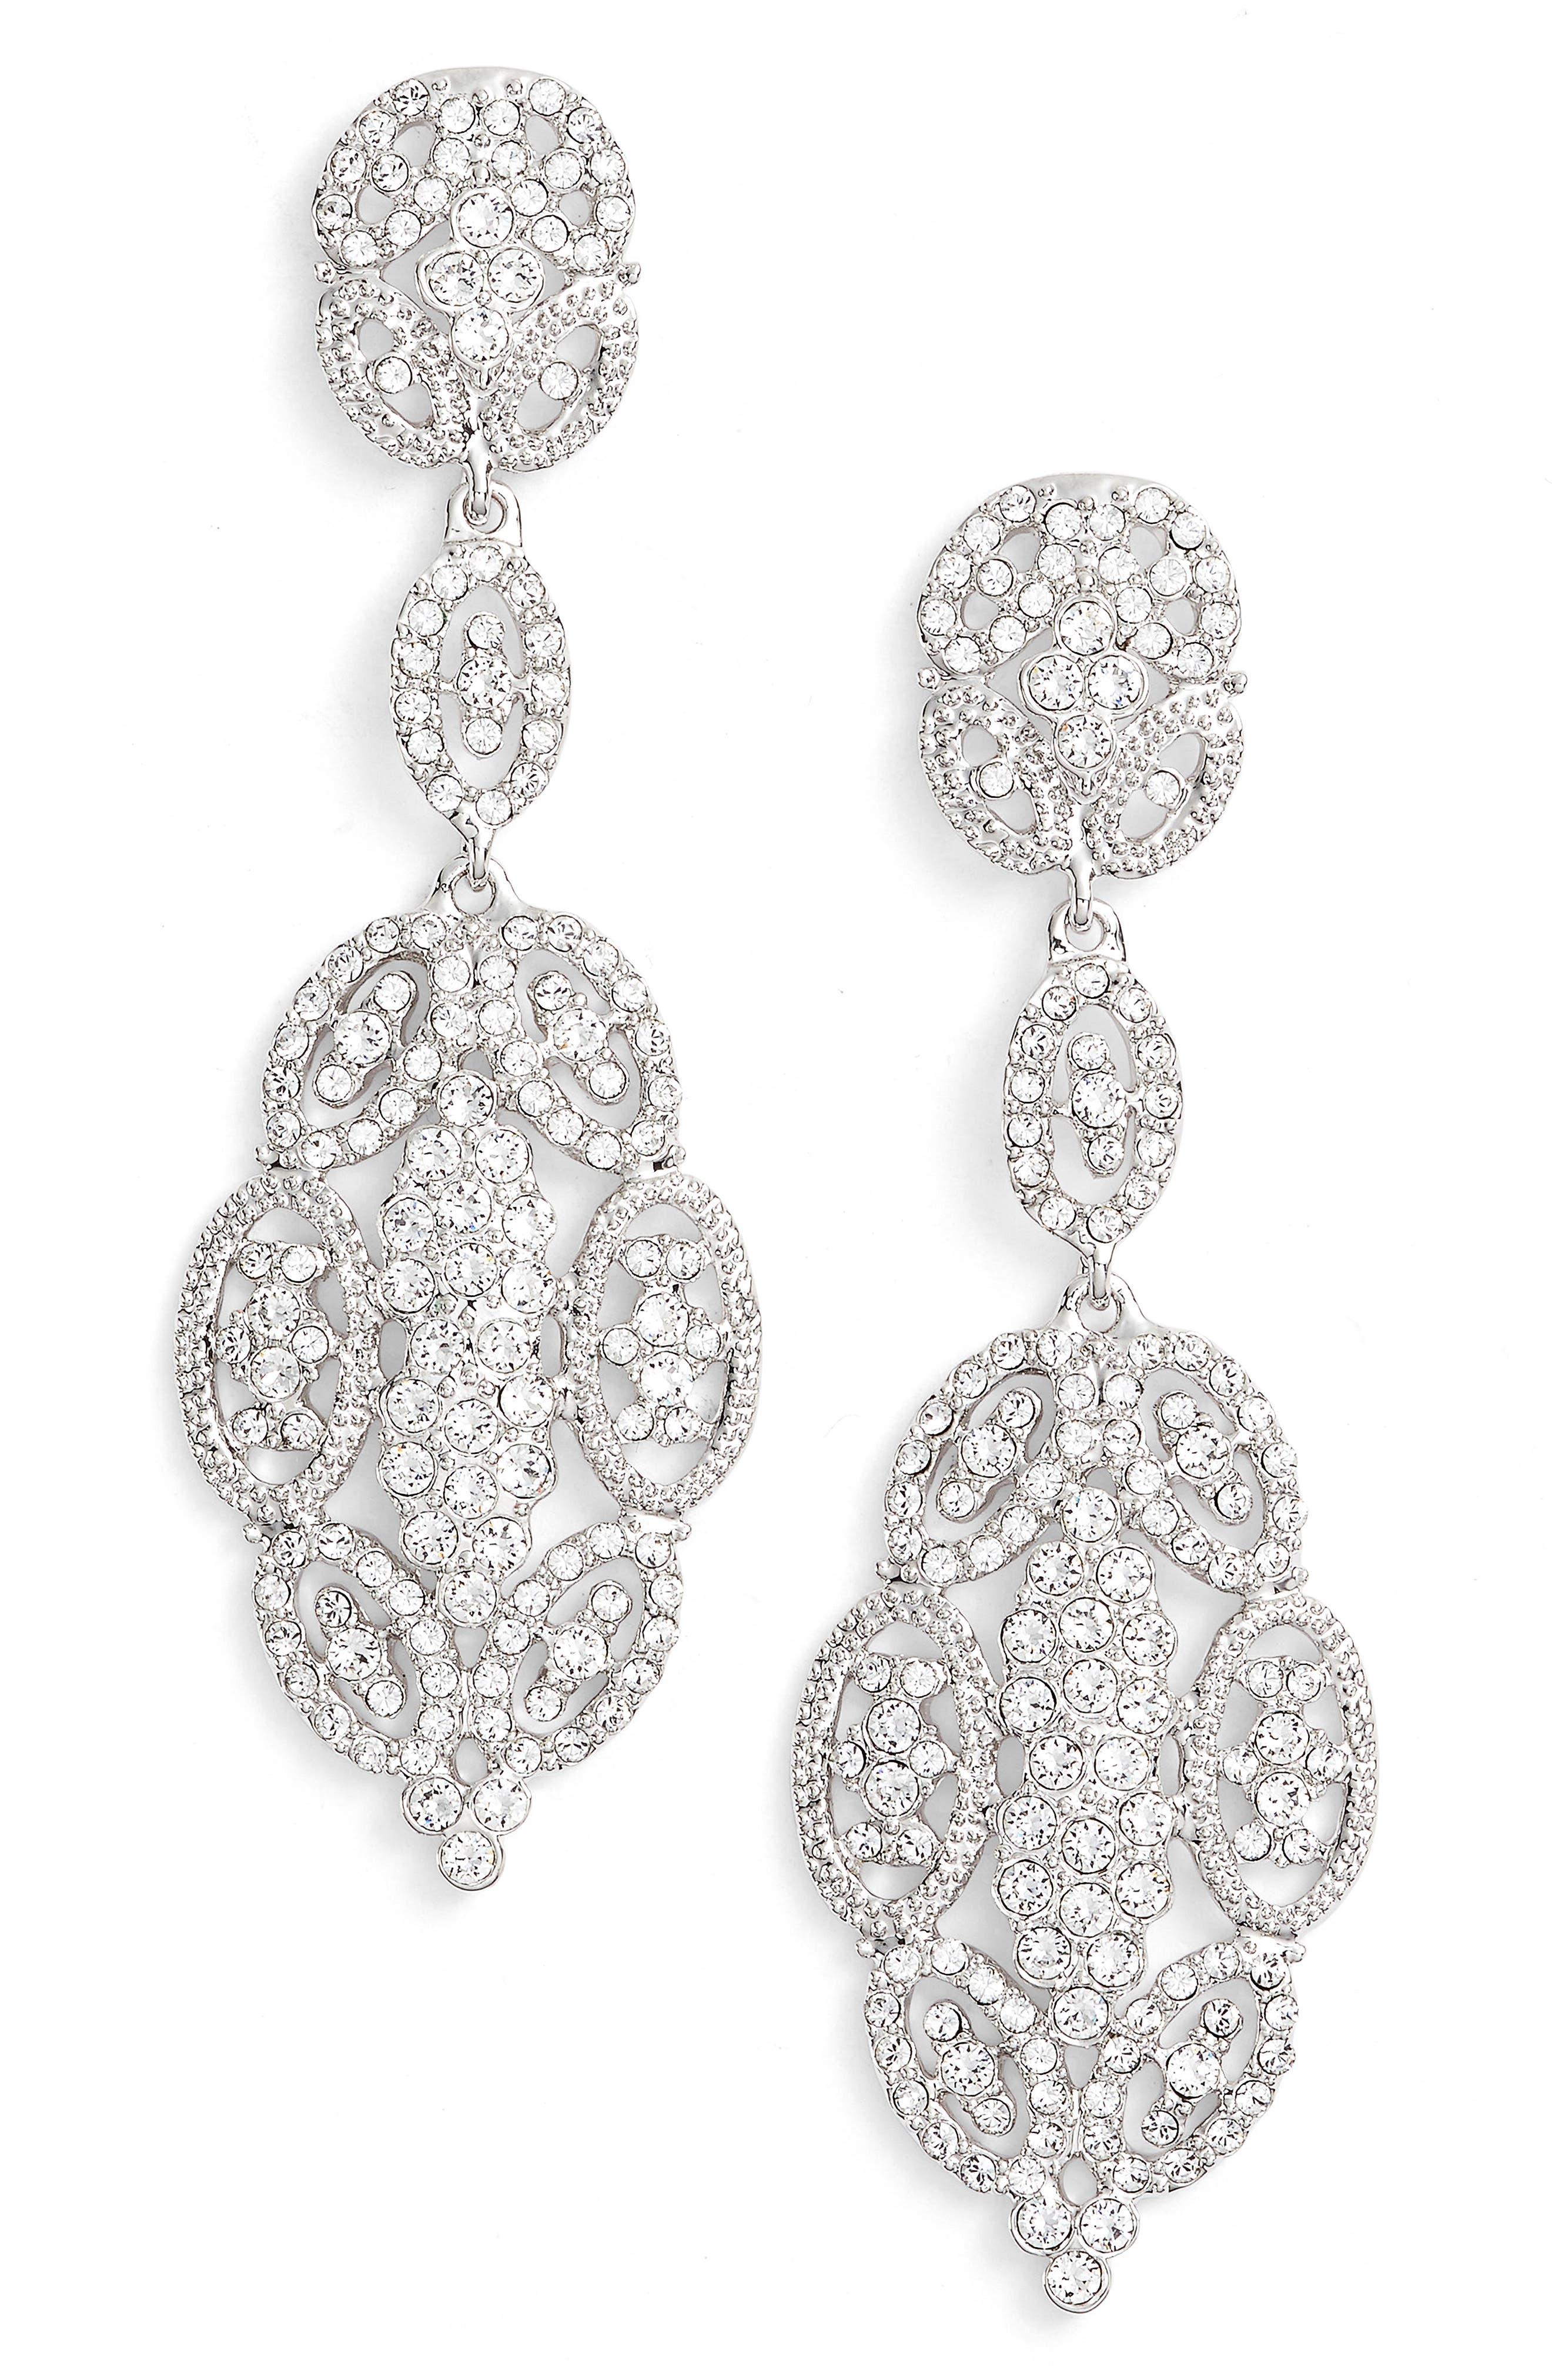 NINA, Glamorous Swarovski Crystal Drop Earrings, Main thumbnail 1, color, 040